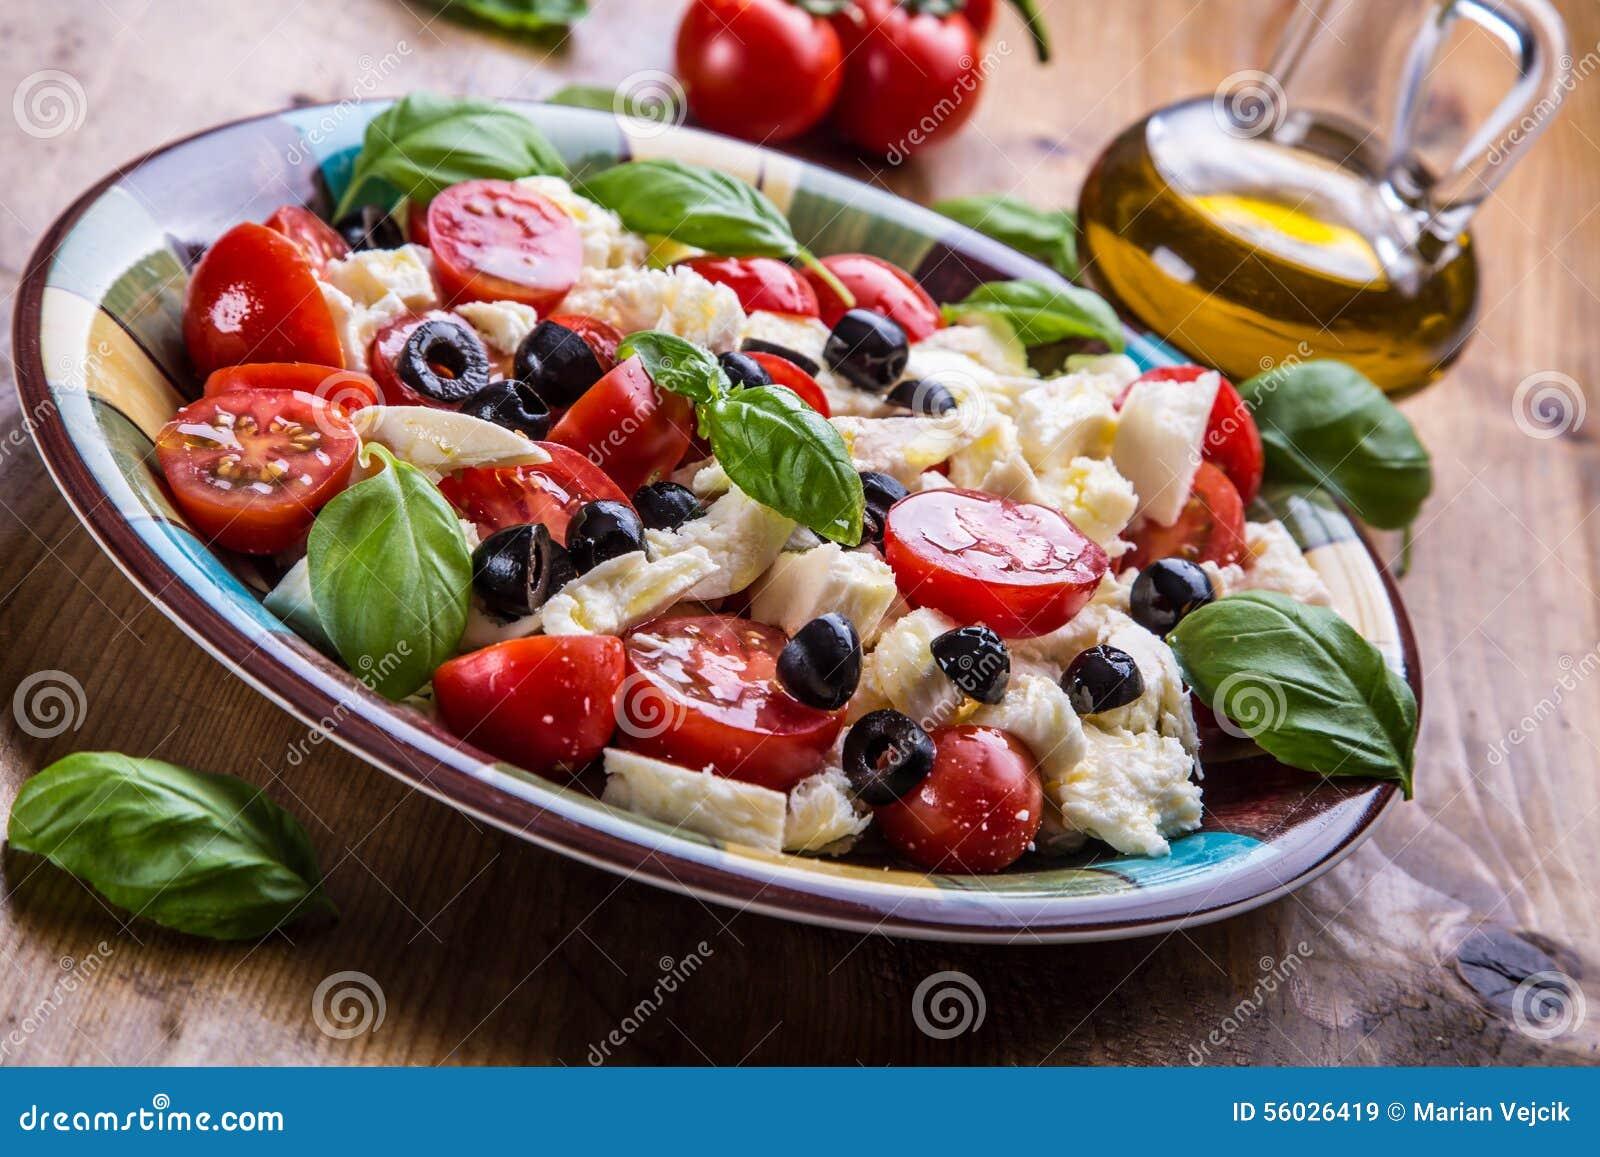 Caprese salade caprese Salade italienne Salade méditerranéenne Cuisine italienne Cuisine méditerranéenne